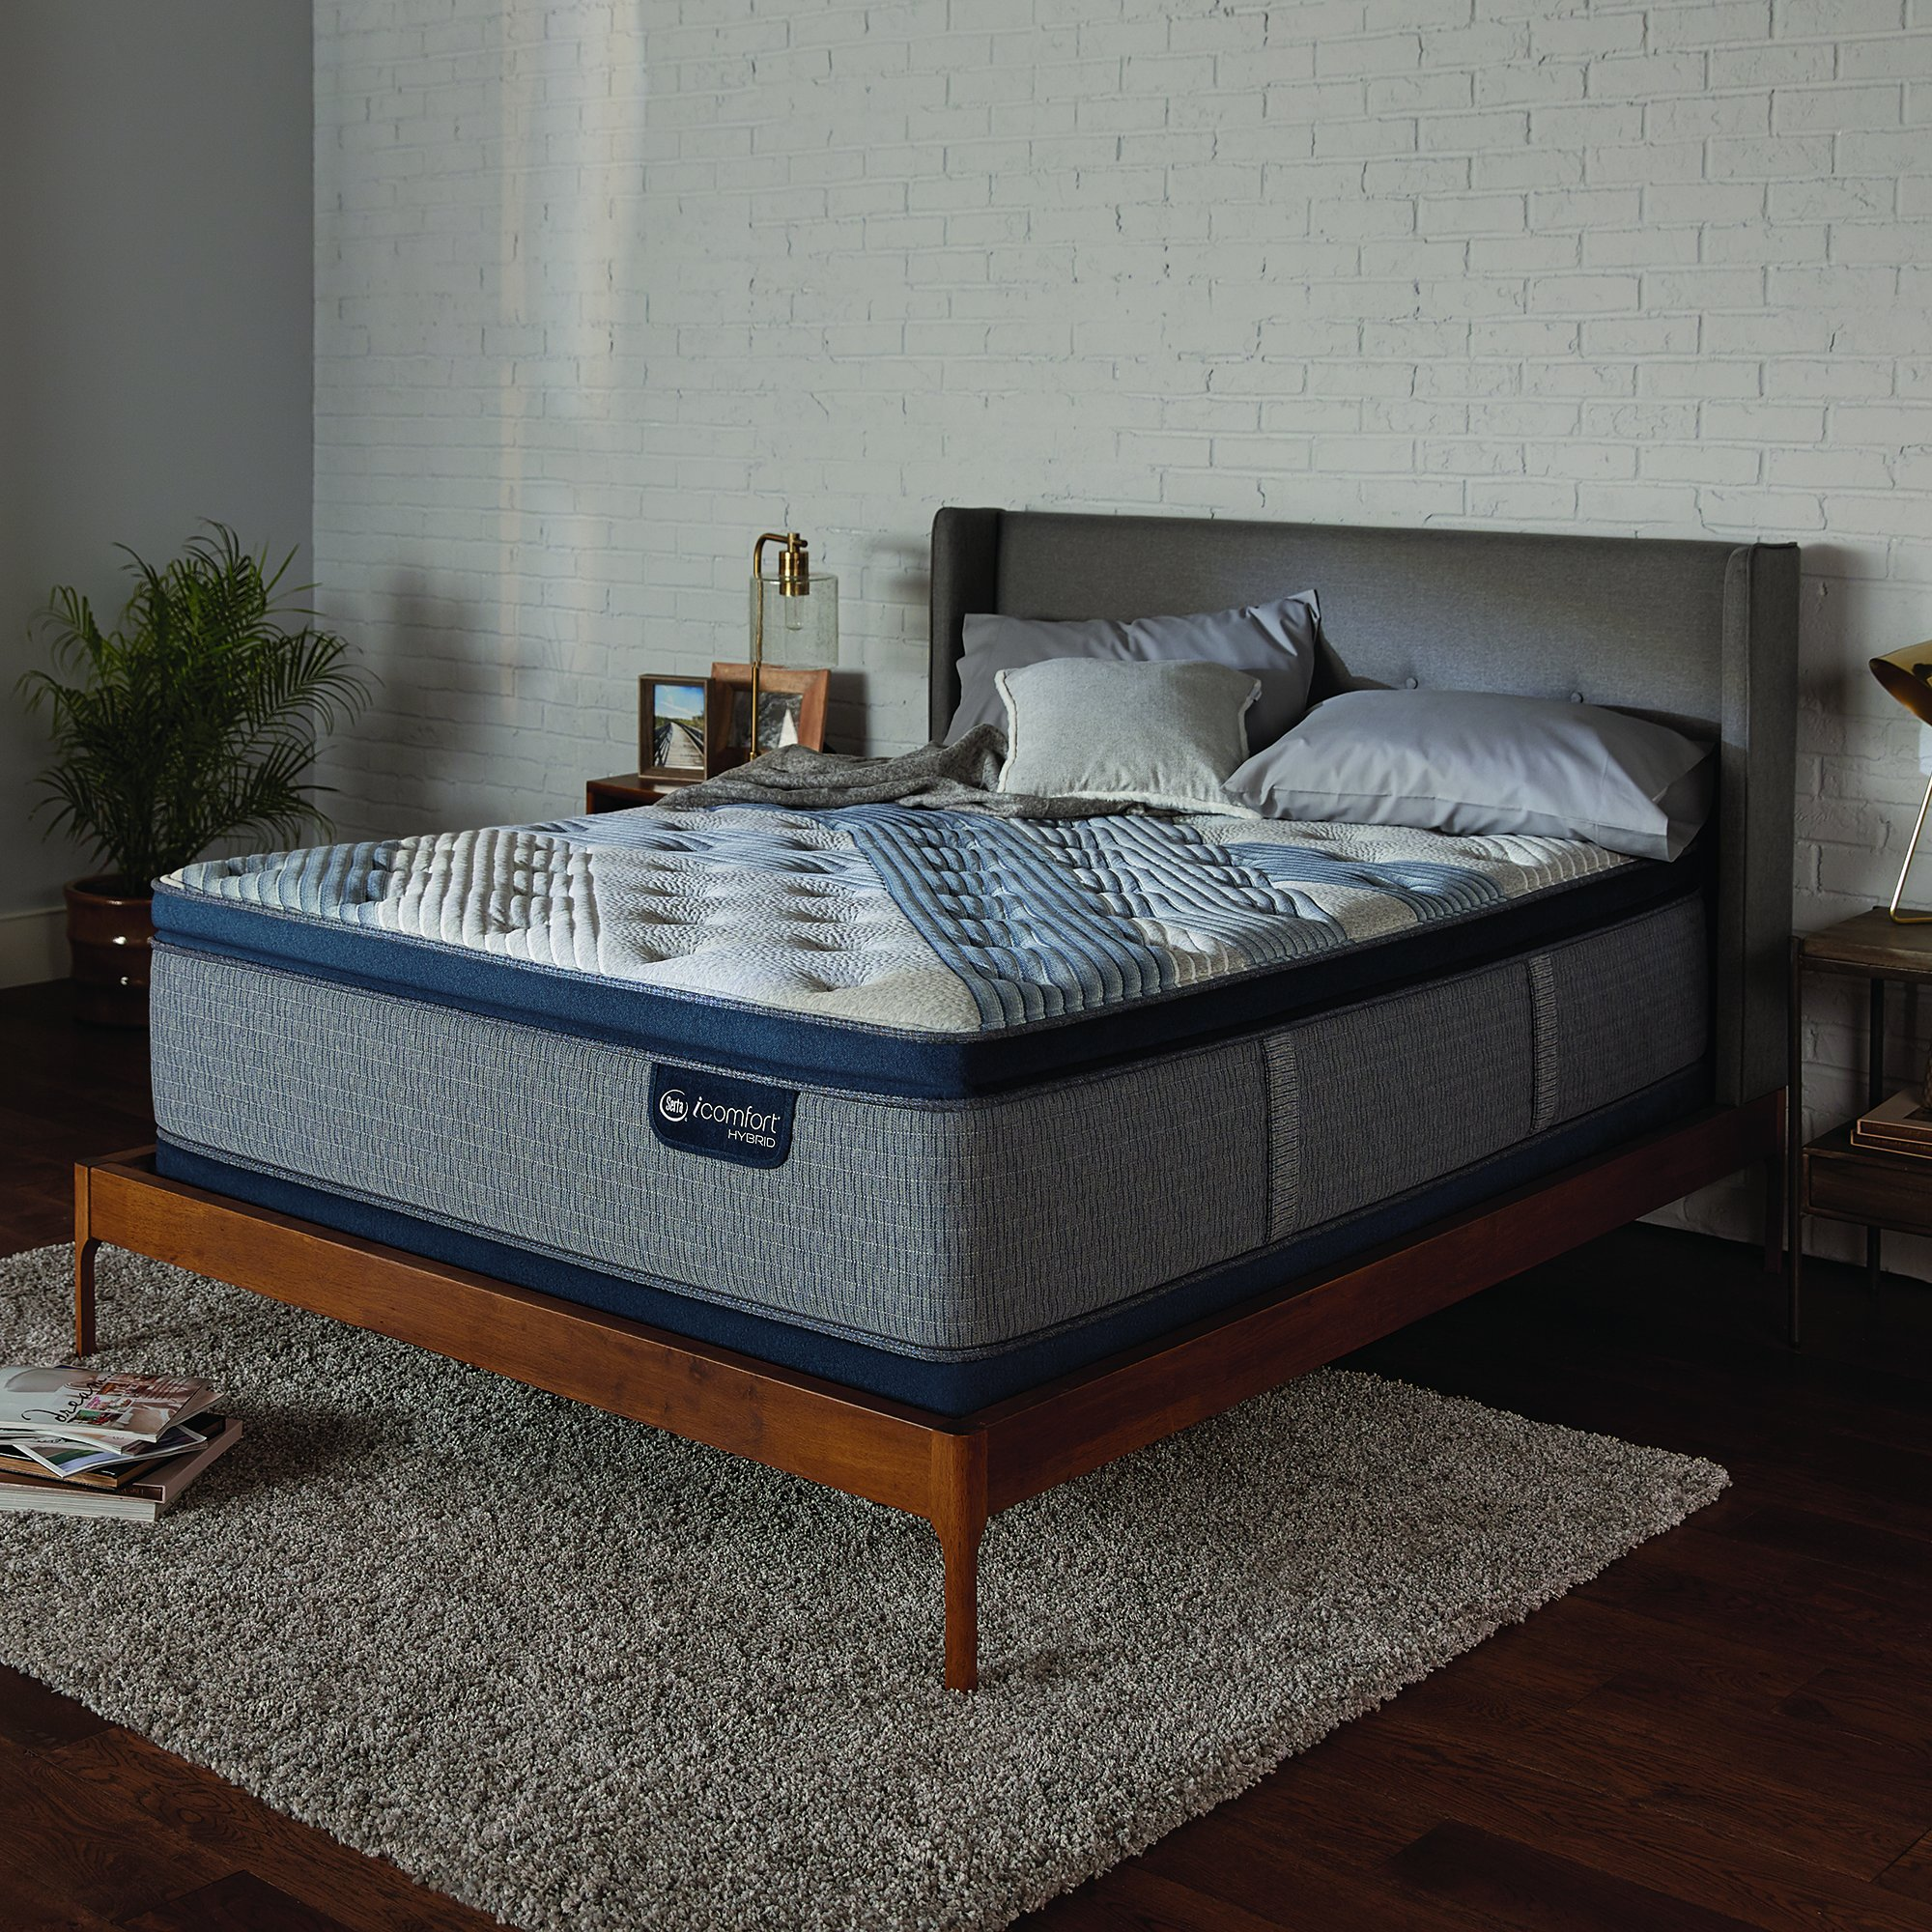 Serta Icomfort Hybrid 14'' Blue Fusion 1000 Plush Conventional Bed Mattress, King, Gray by Serta